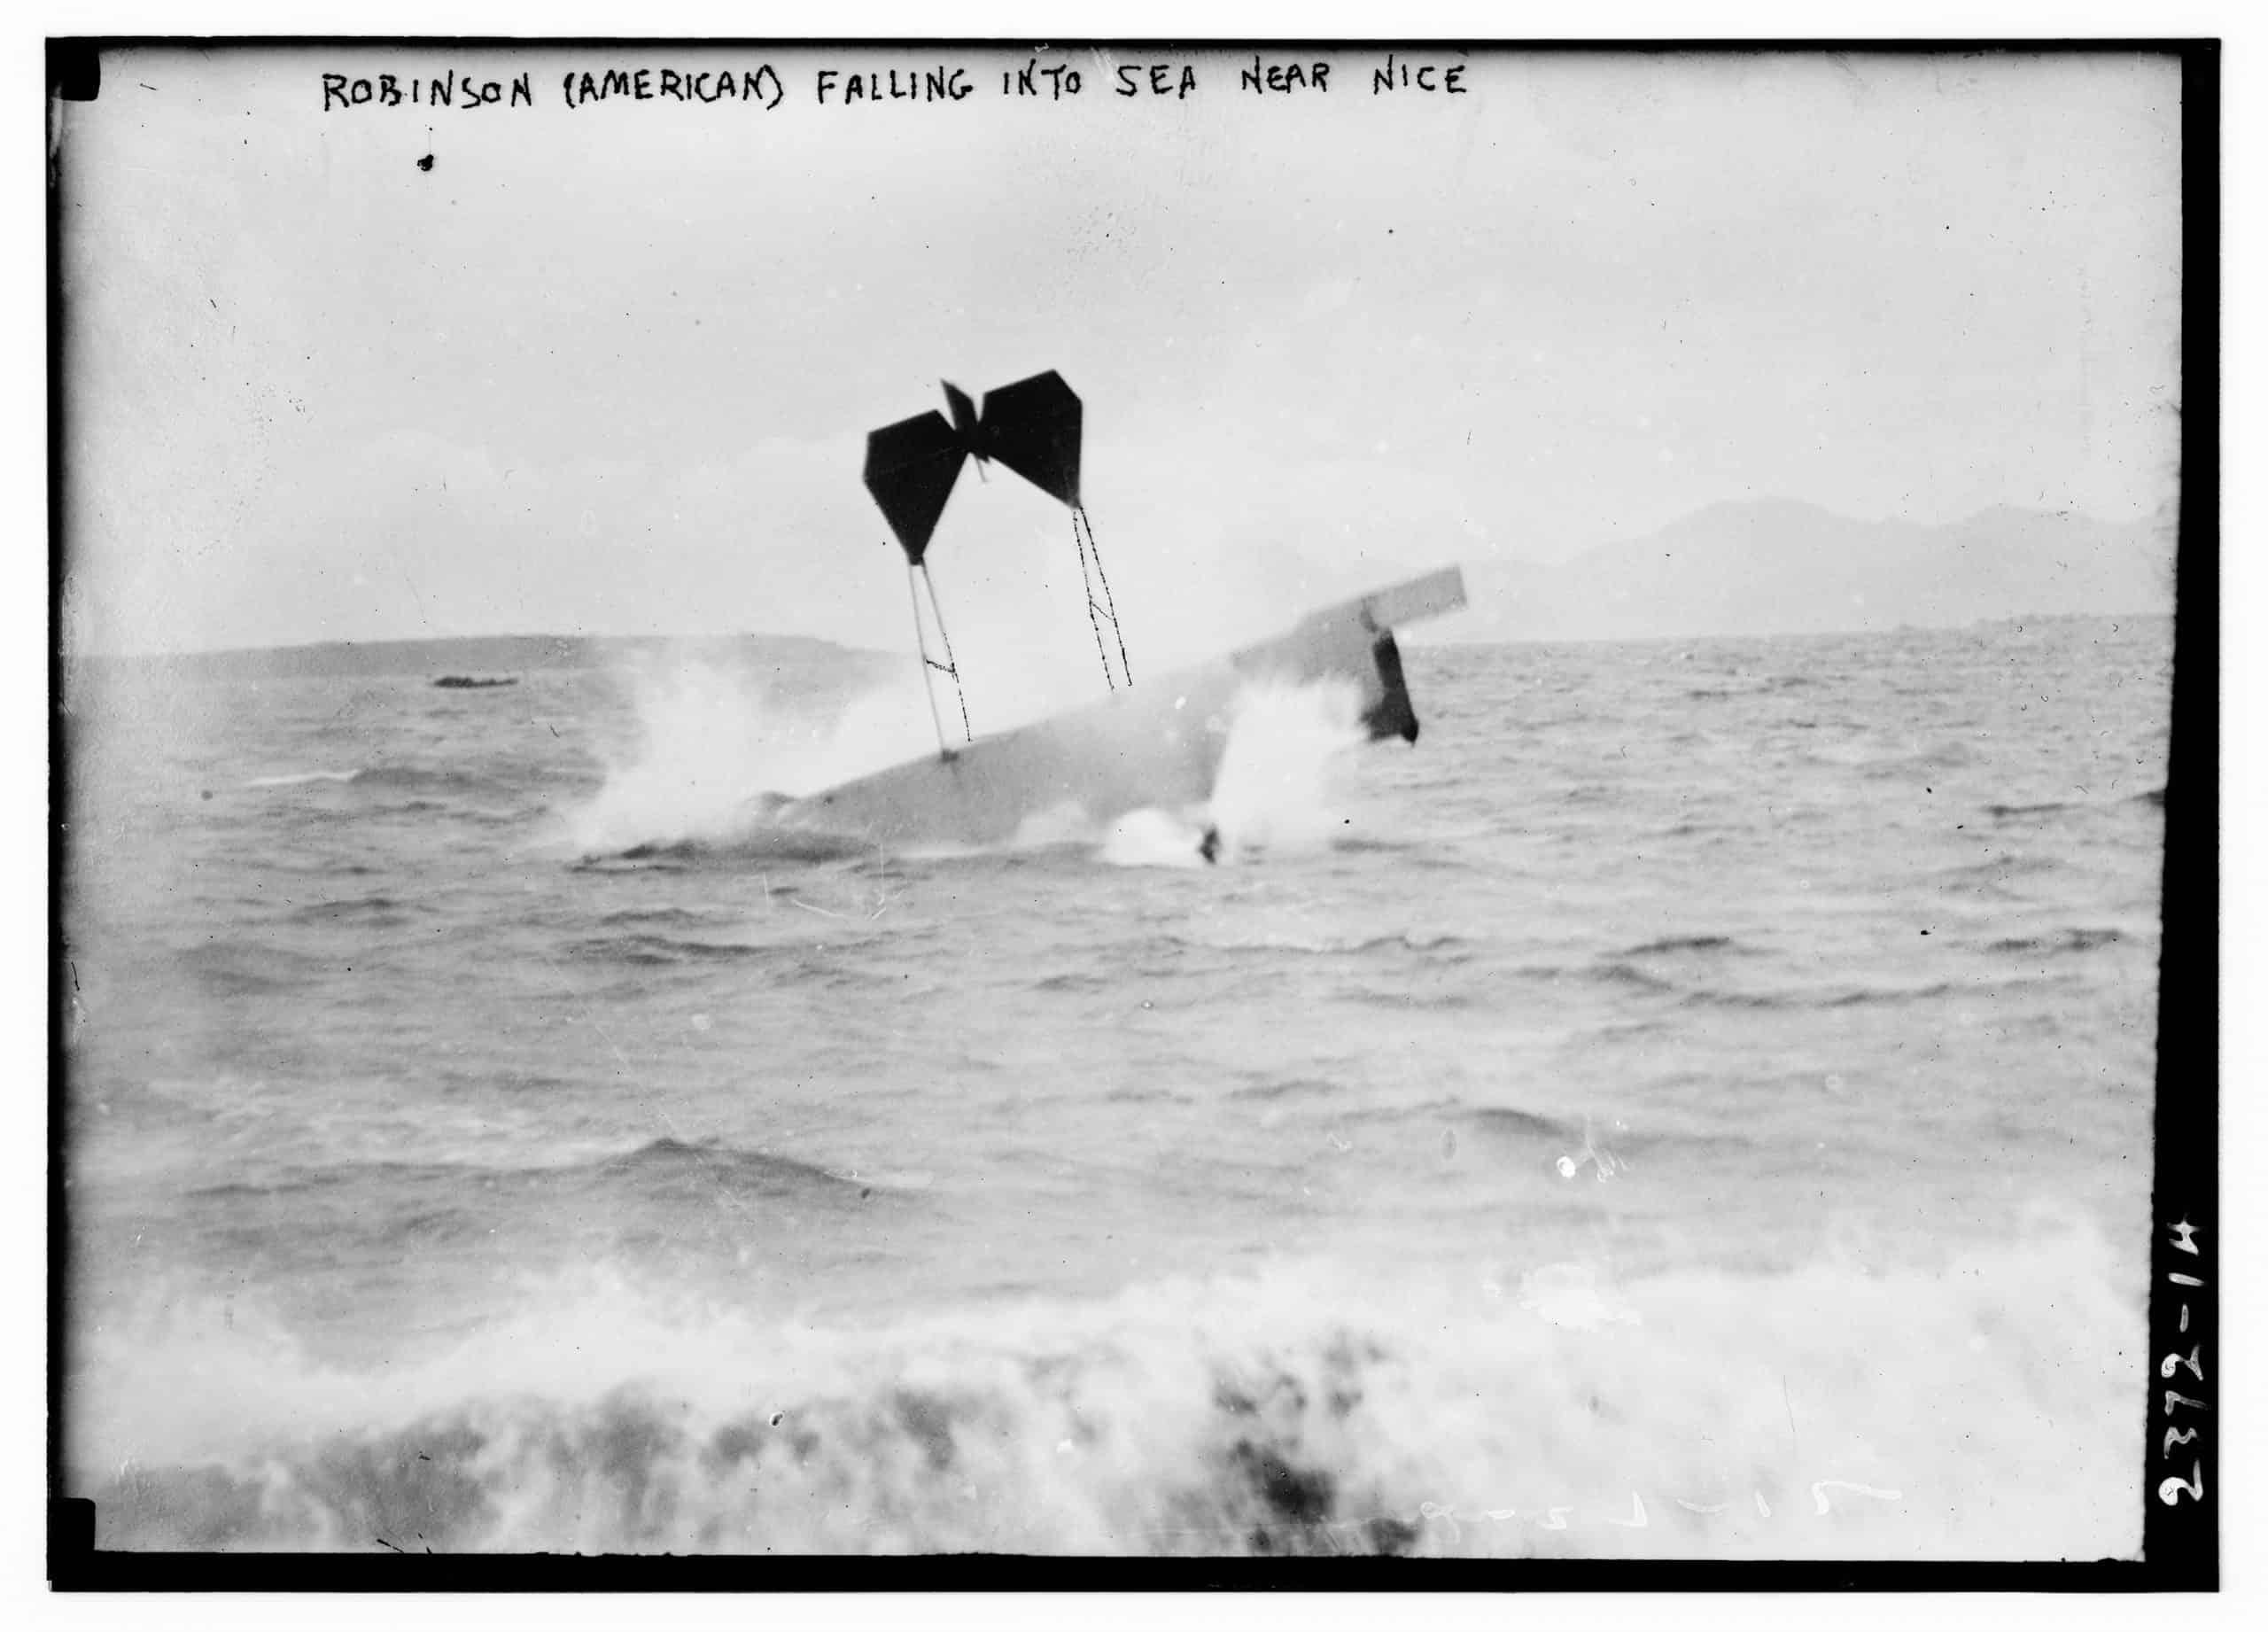 Robinson (American) falling into sea near Nice, Photo shows airplane of pilot and daredevil Hugh Armstrong Robinson making a crash landing on water near Nice, France, Bain News Service, 1912